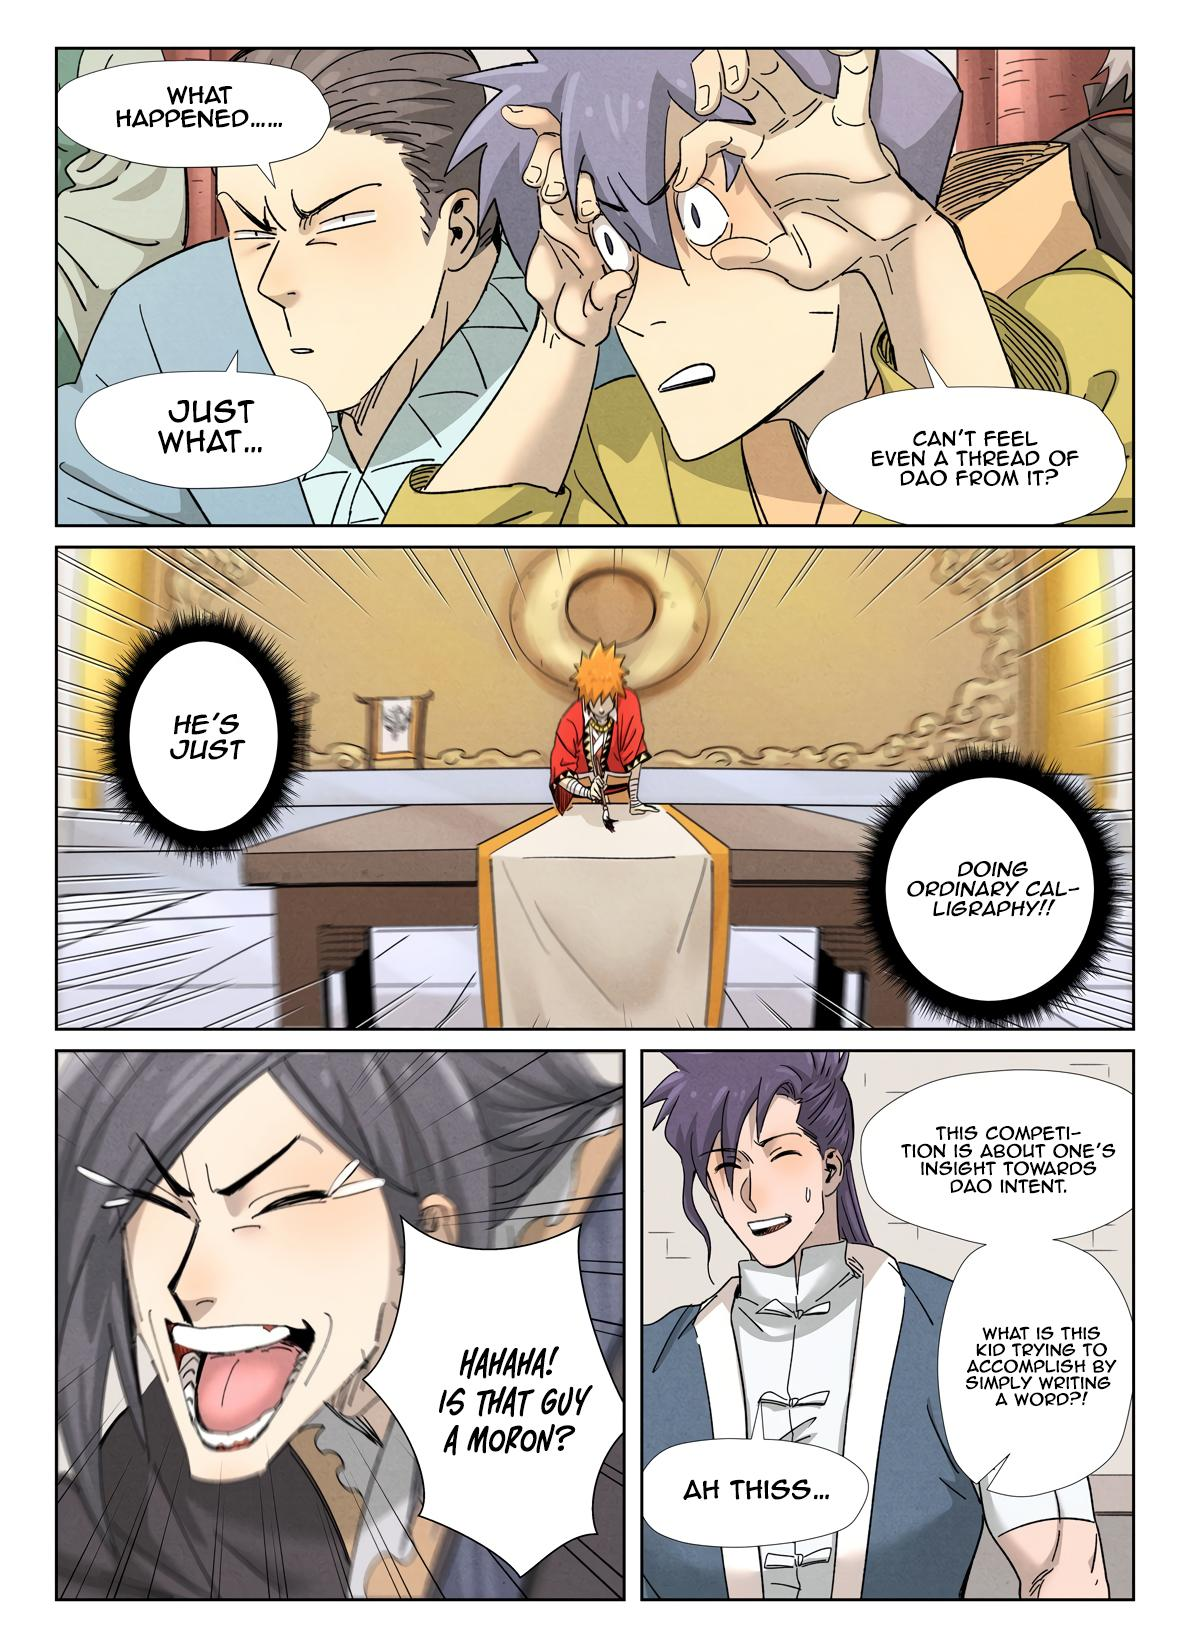 Tales Of Demons And Gods Chapter 341.1 page 8 - Mangakakalot